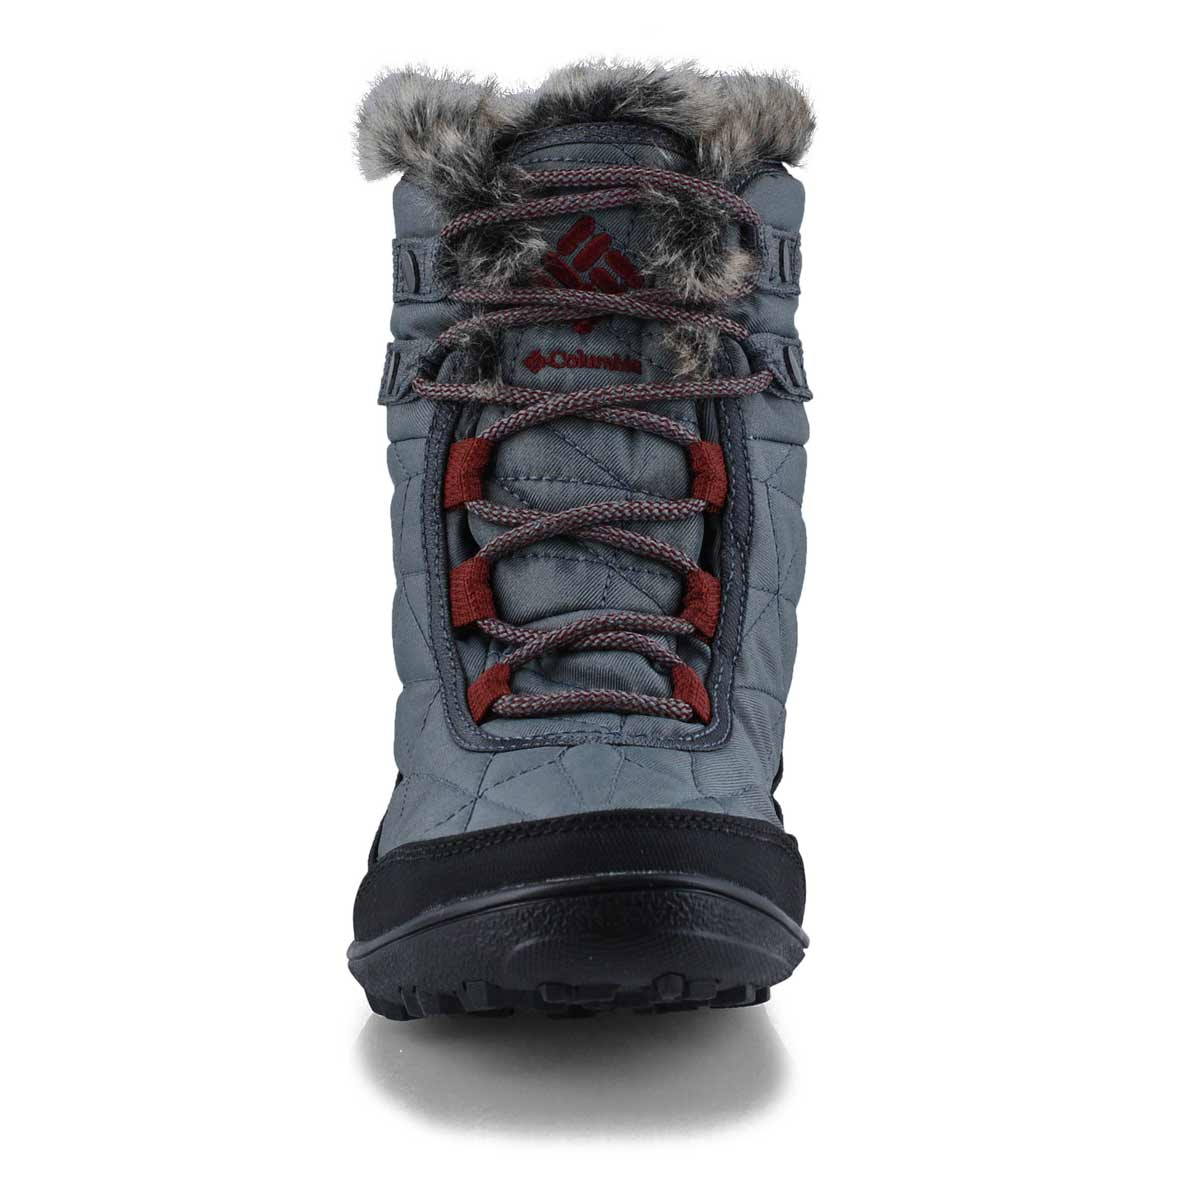 Women's MINX SHORTY III  graphite wtpf boots